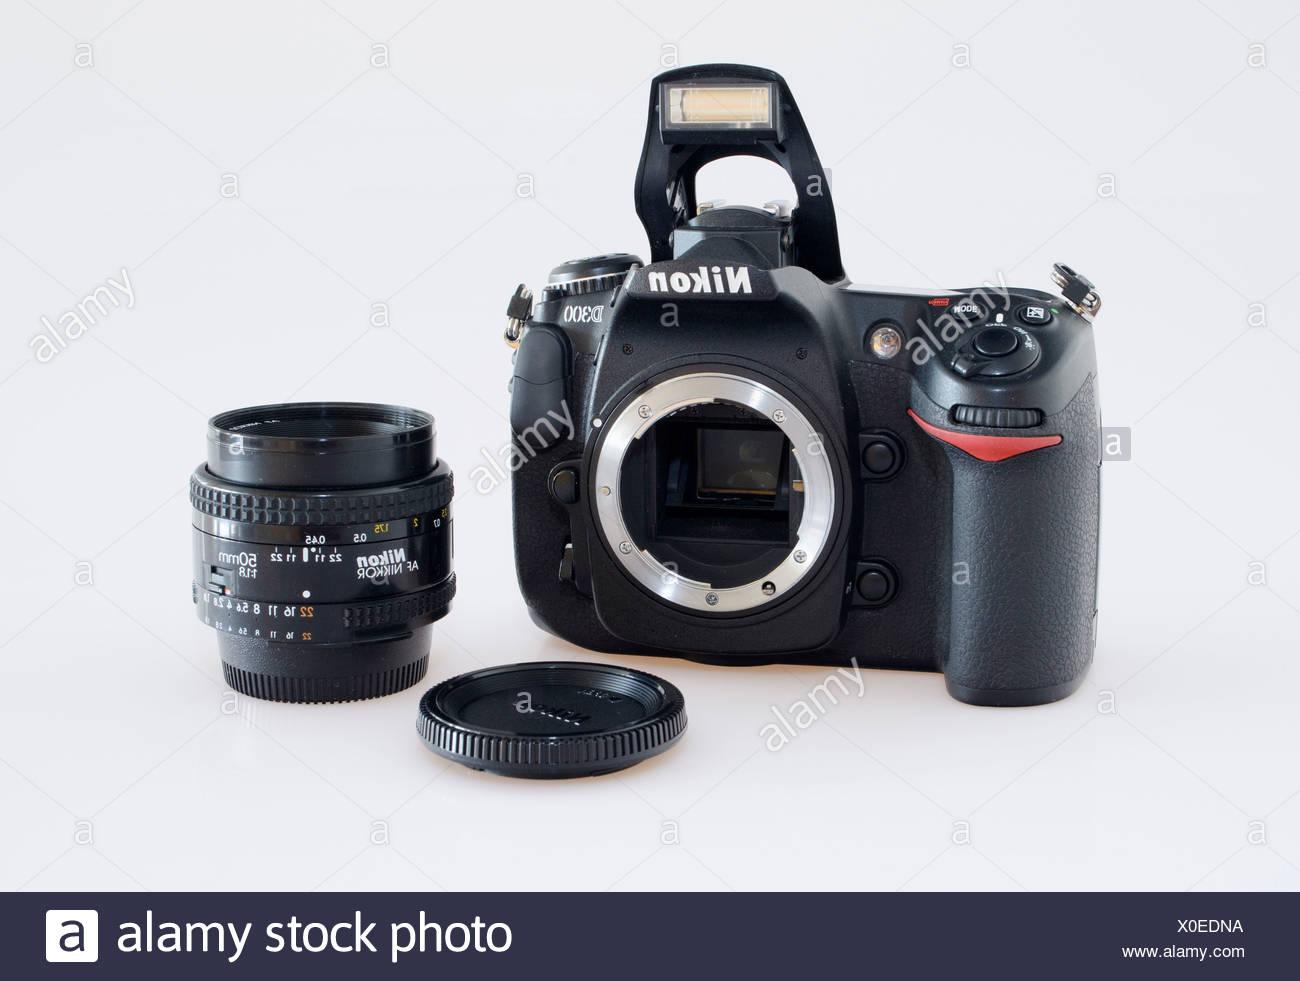 Nikon D300 SLR-Digitalkamera mit einem 50mm Objektiv Stockbild